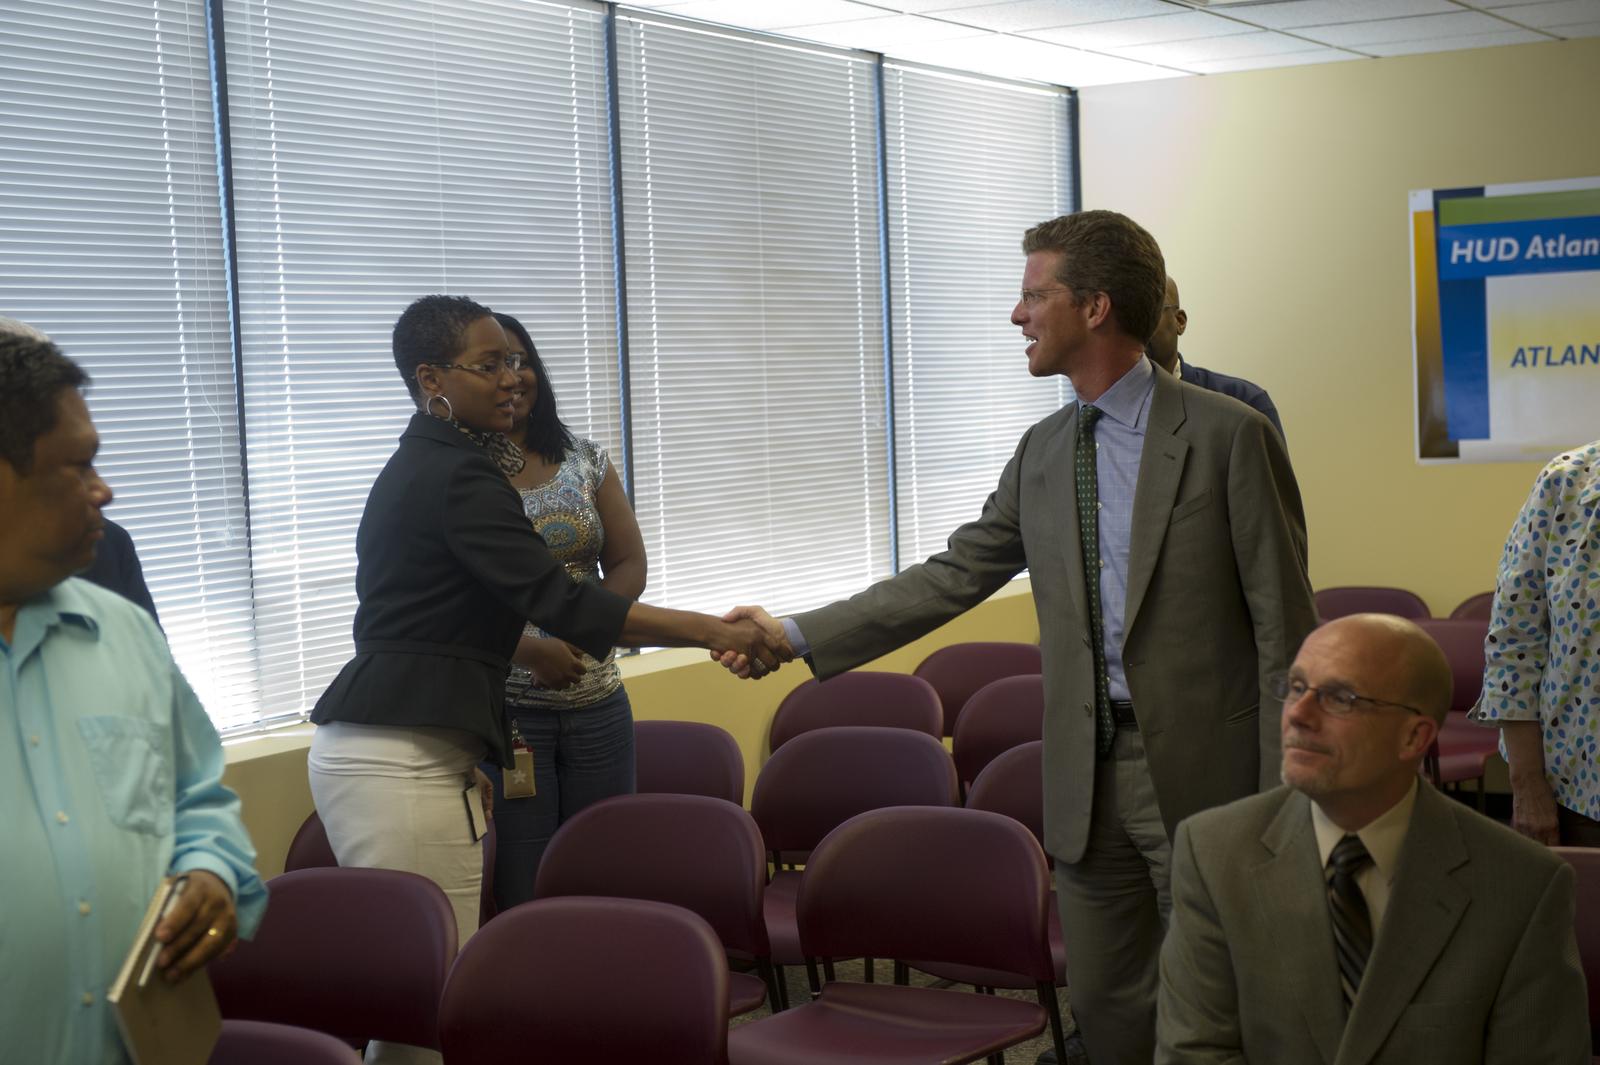 Atlanta, Georgia town hall meeting,  [with Secretary Shaun Donovan among officials on hand]